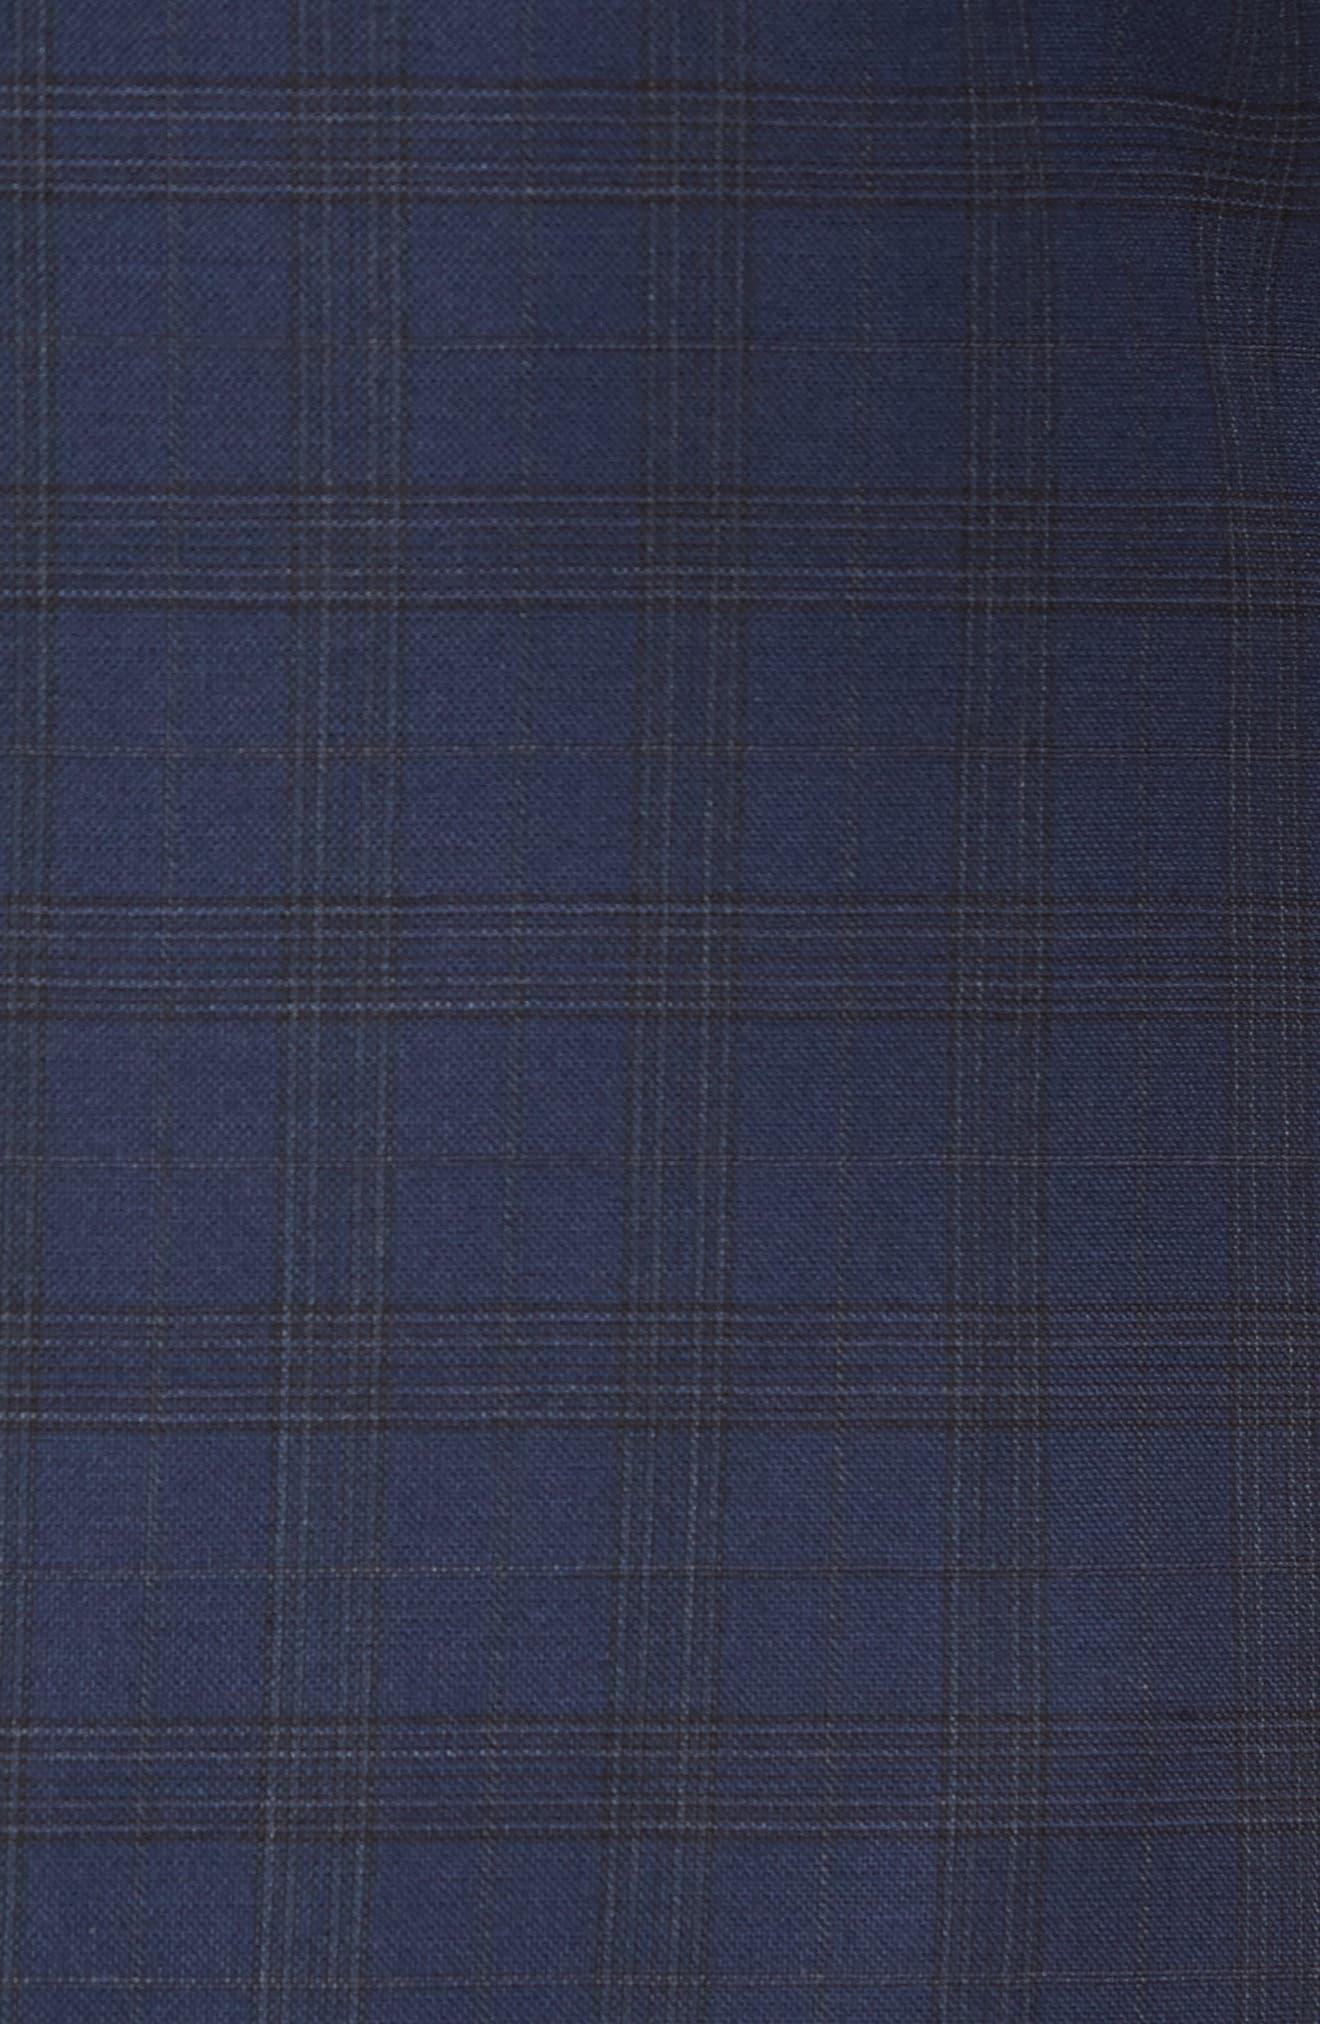 Jetsetter Slim Fit Stretch Wool Sport Coat,                             Alternate thumbnail 5, color,                             SUBTLE NAVY PLAID